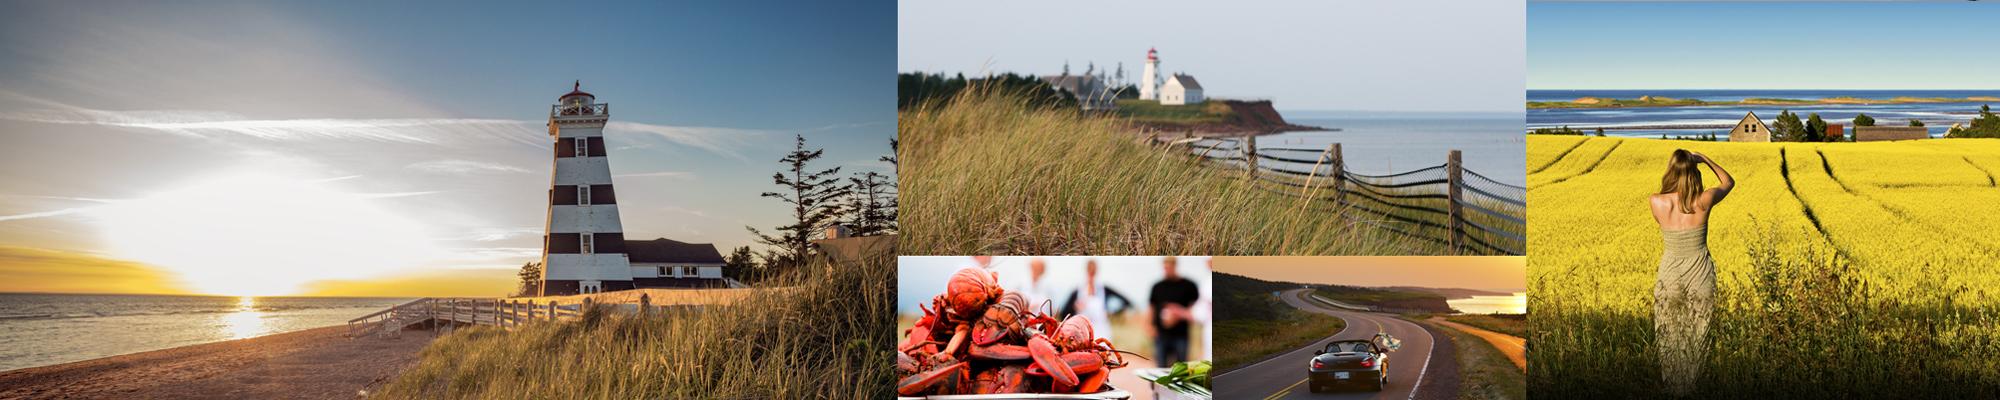 parco nazionale Prince Edward Island Canada